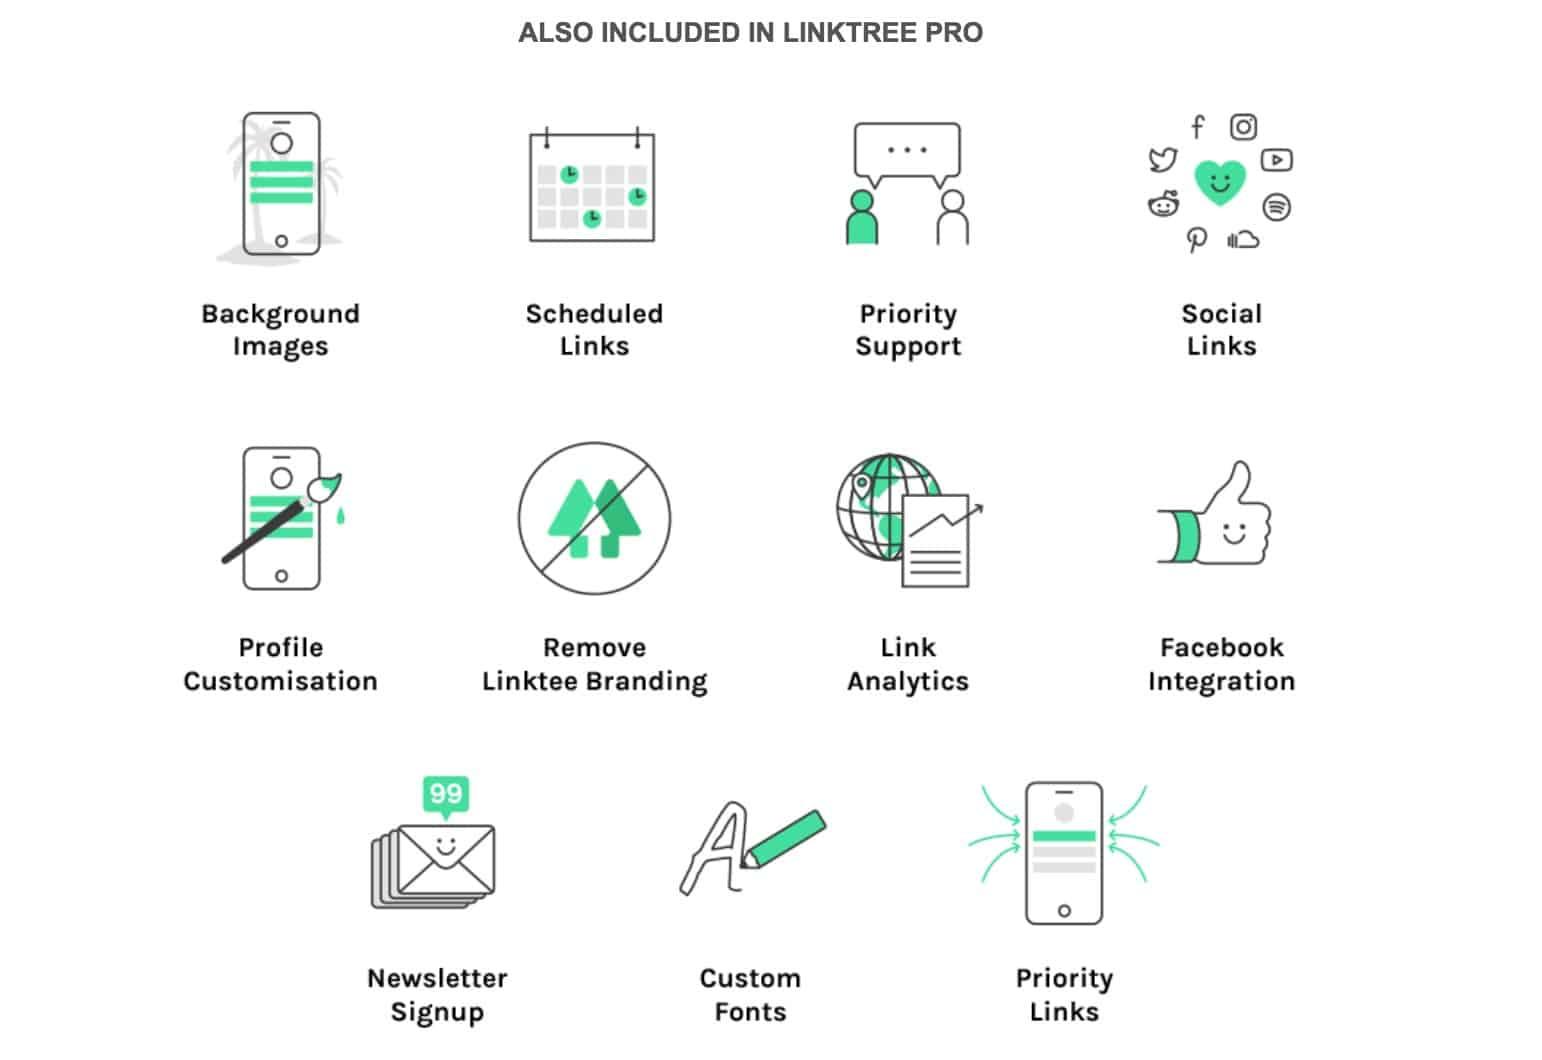 Linktree pro options